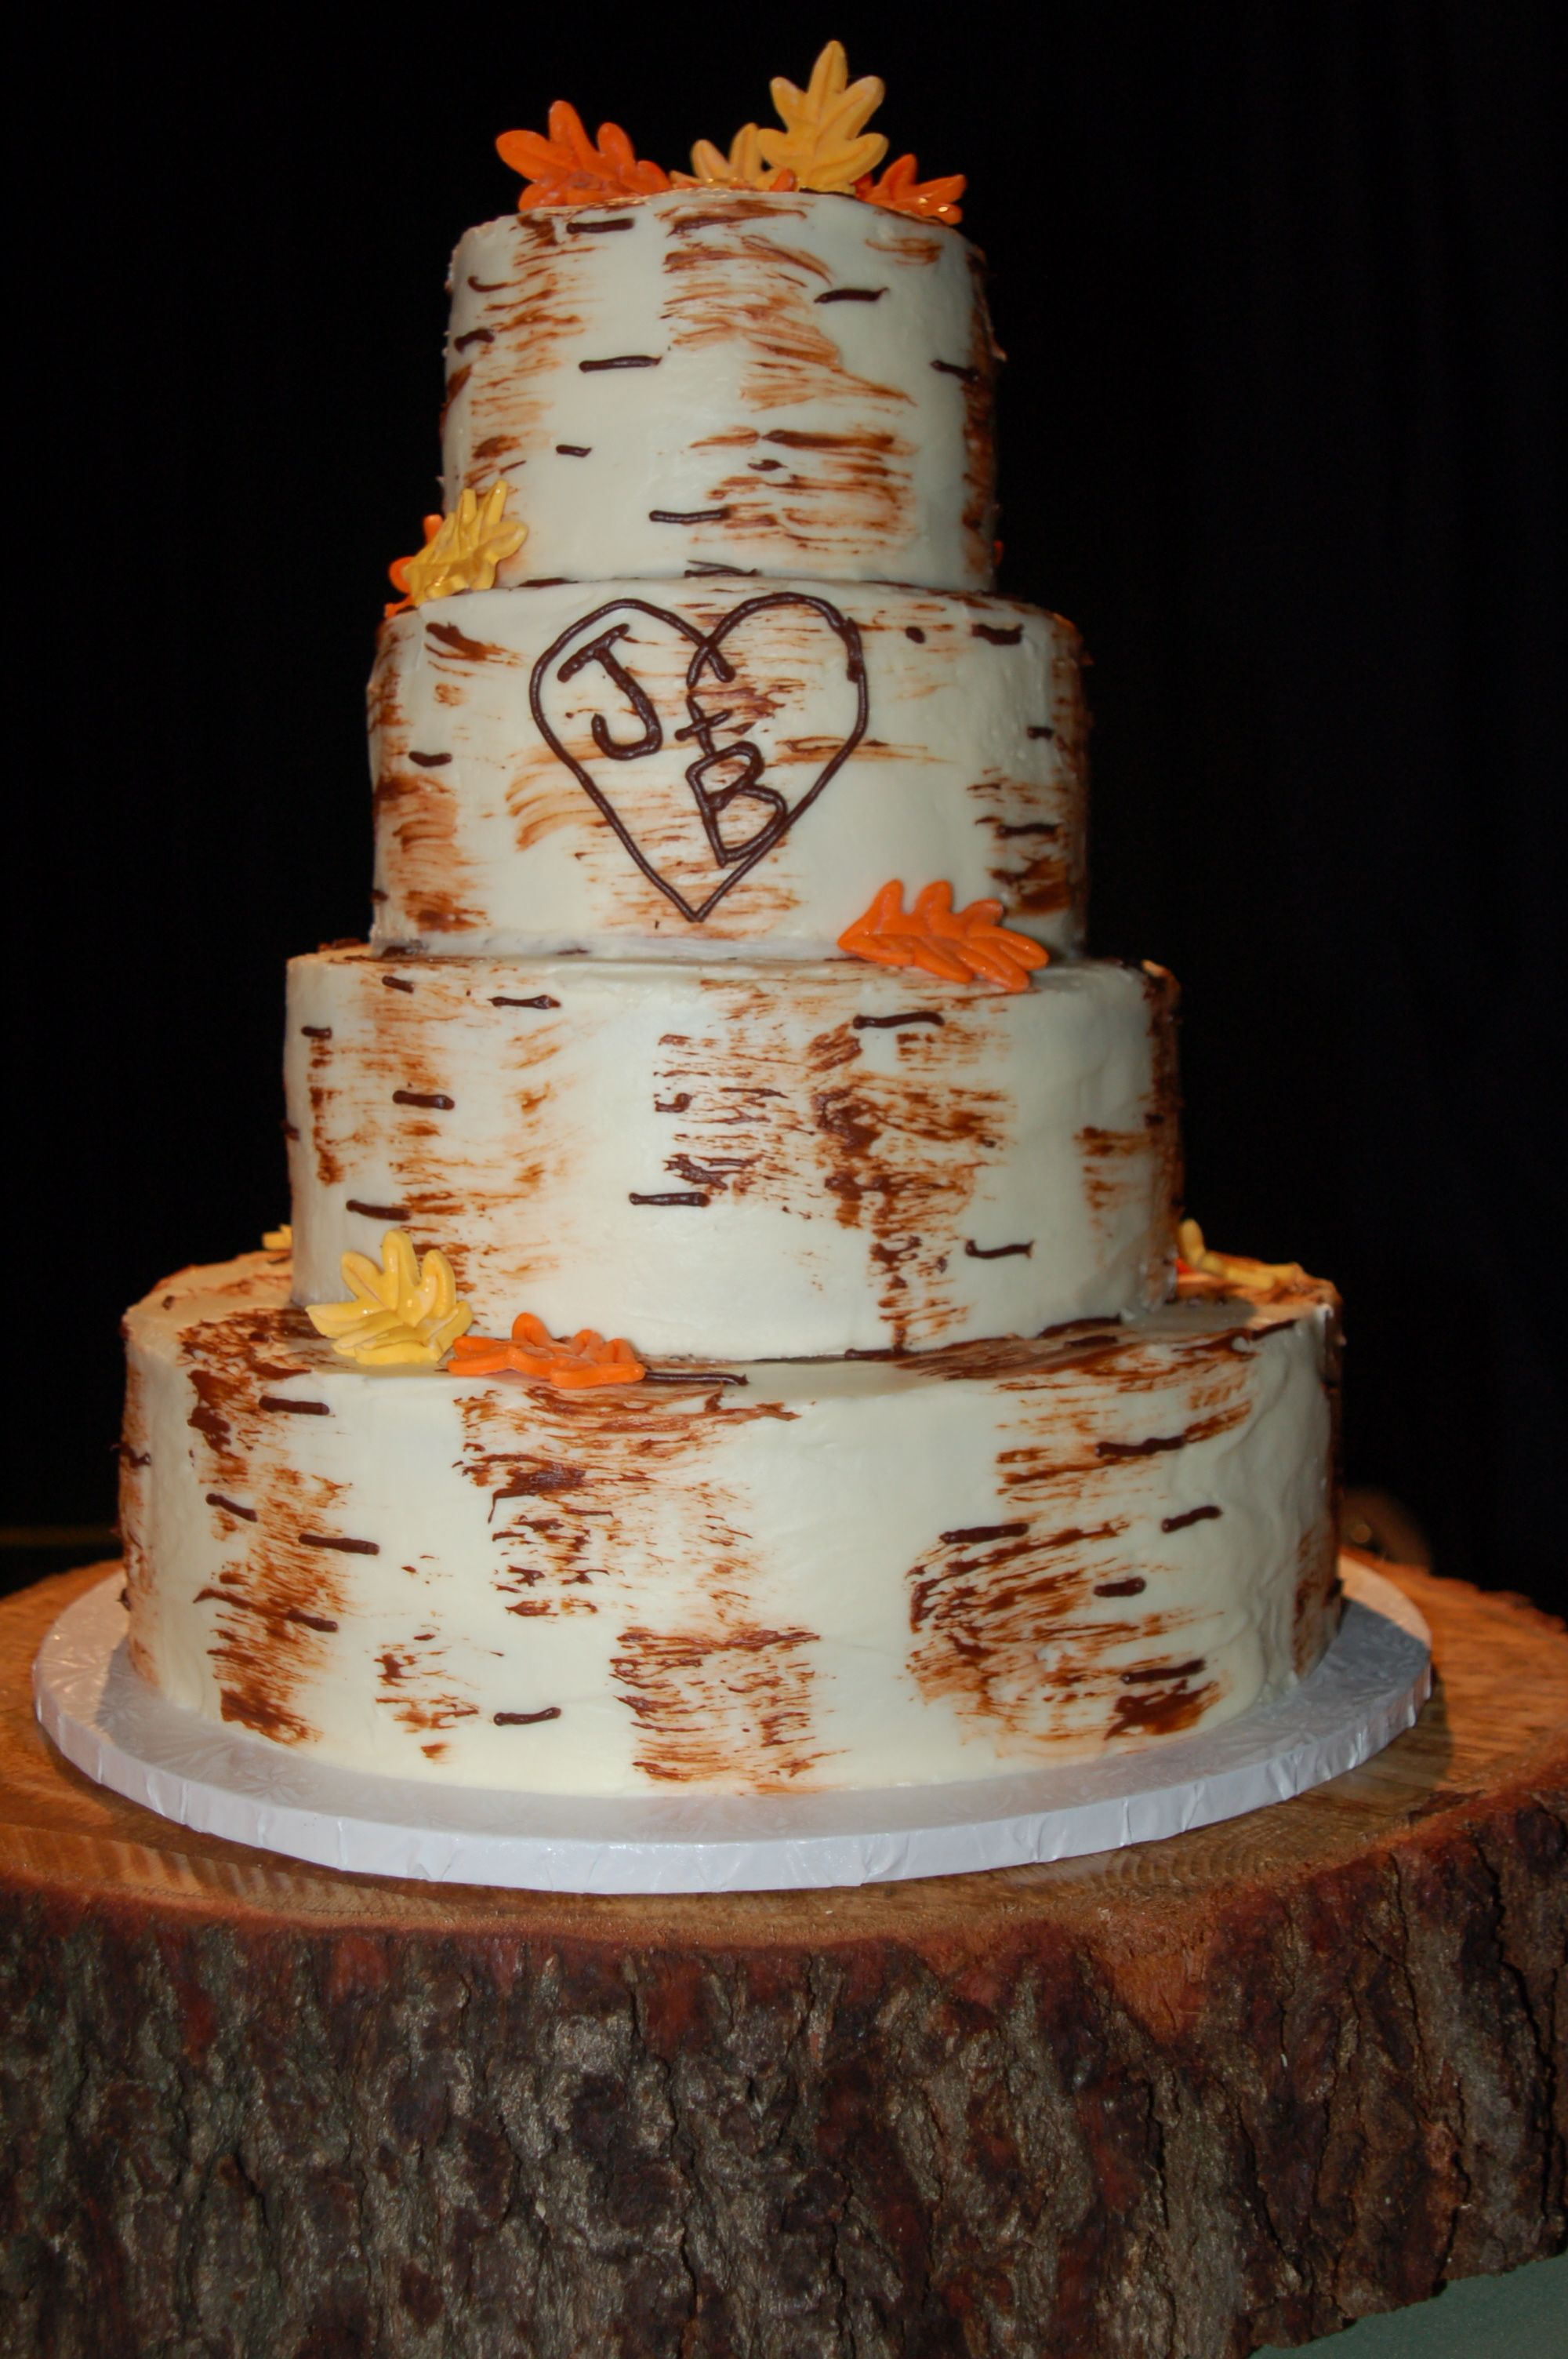 Tree Bark Wedding Cake With Tree Stump Cake Stand Cakes - Wedding Cake Tree Bark